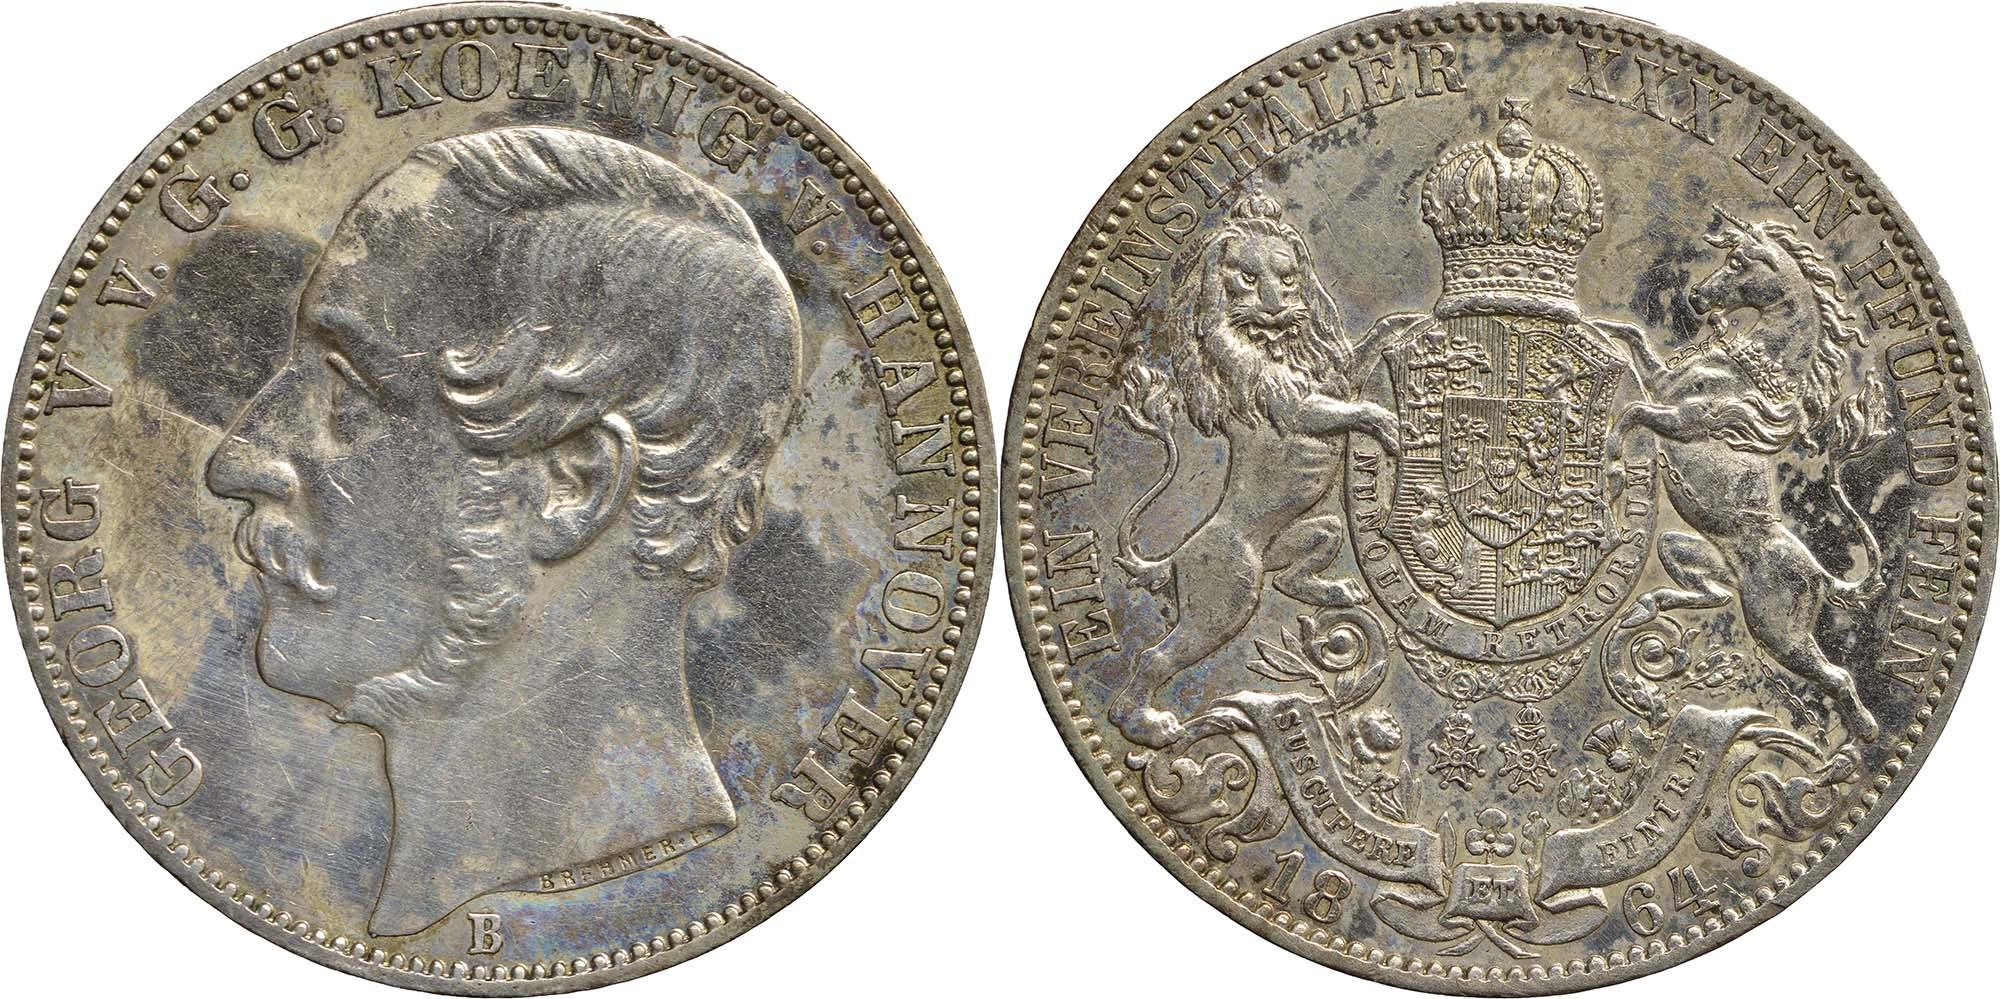 Lieferumfang:Deutschland : 1 Vereinstaler Gerog V.  1864 ss/vz.